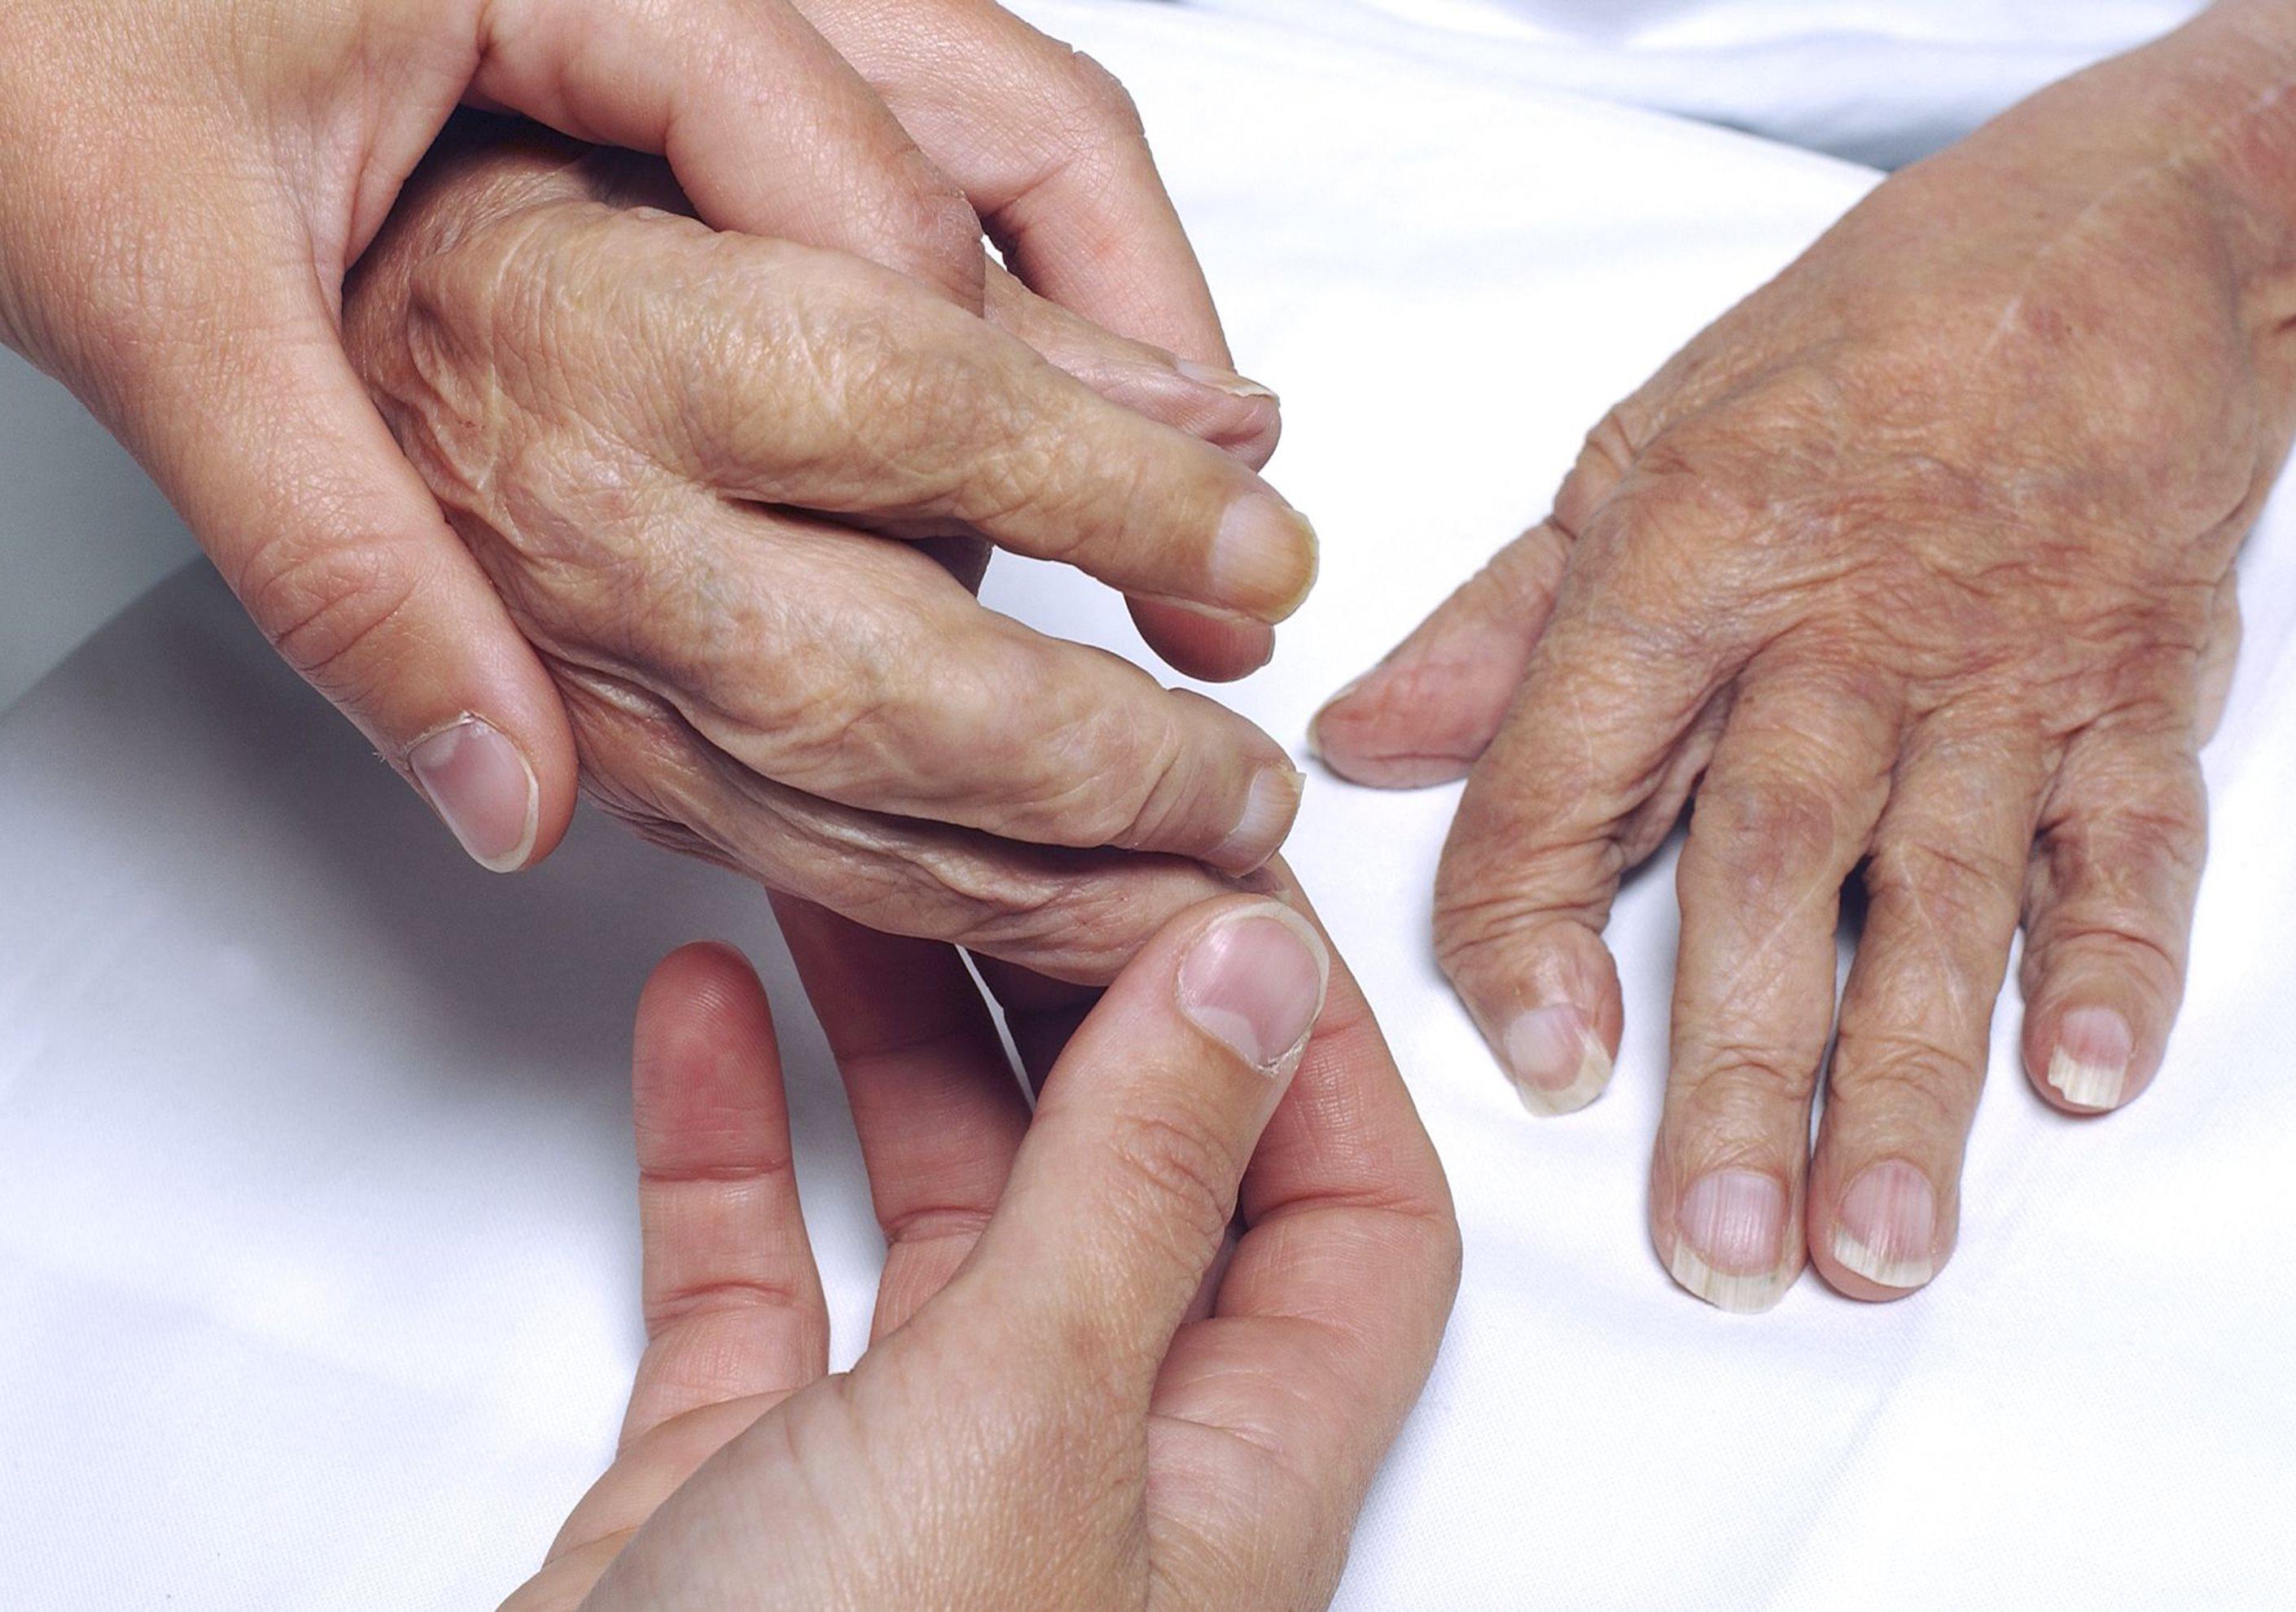 inflammatory diseases radboudumc